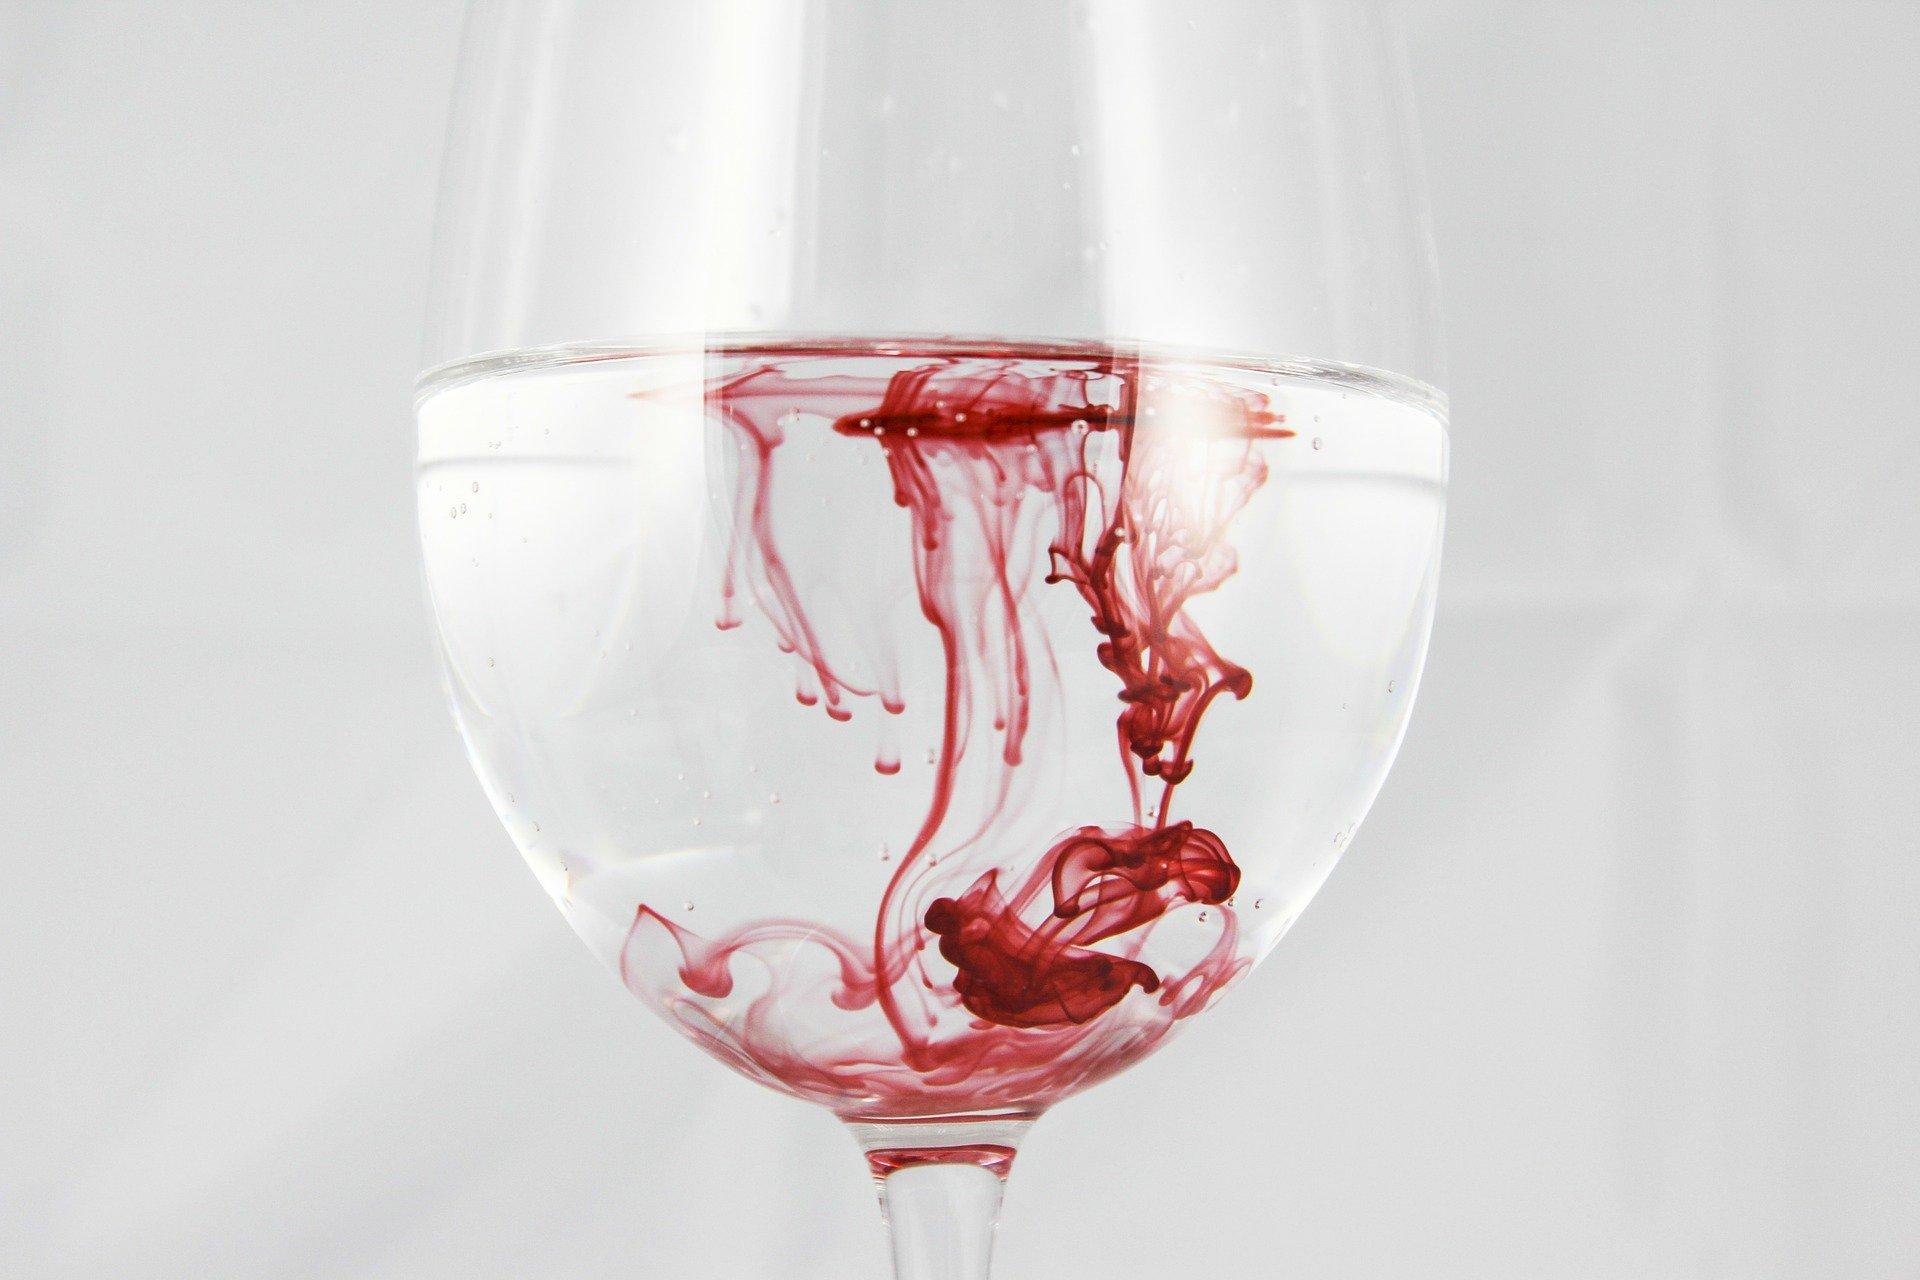 Rêver de sang